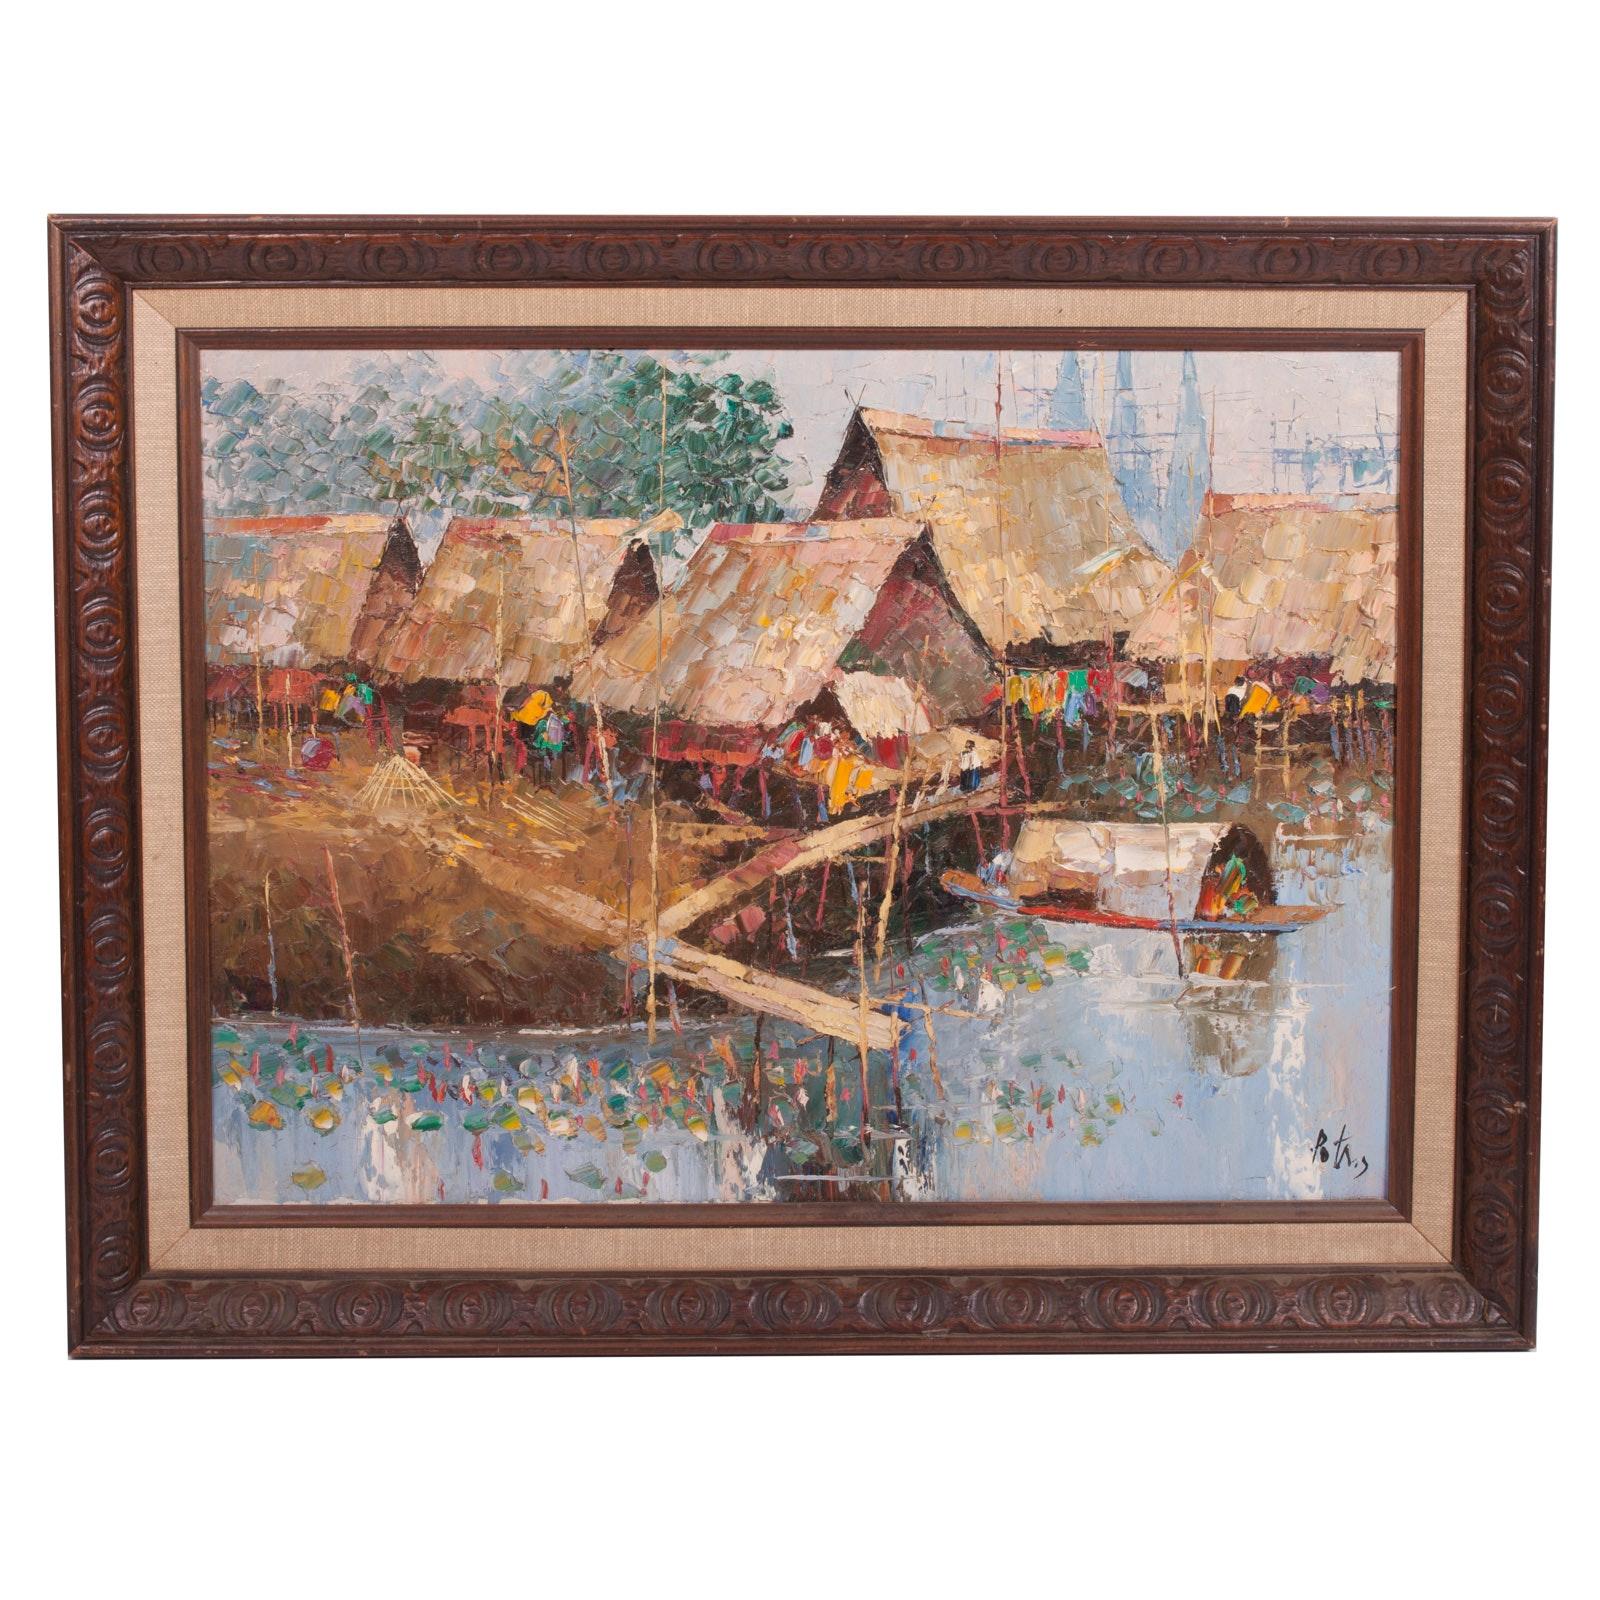 Signed Impasto Oil on Canvas Landscape